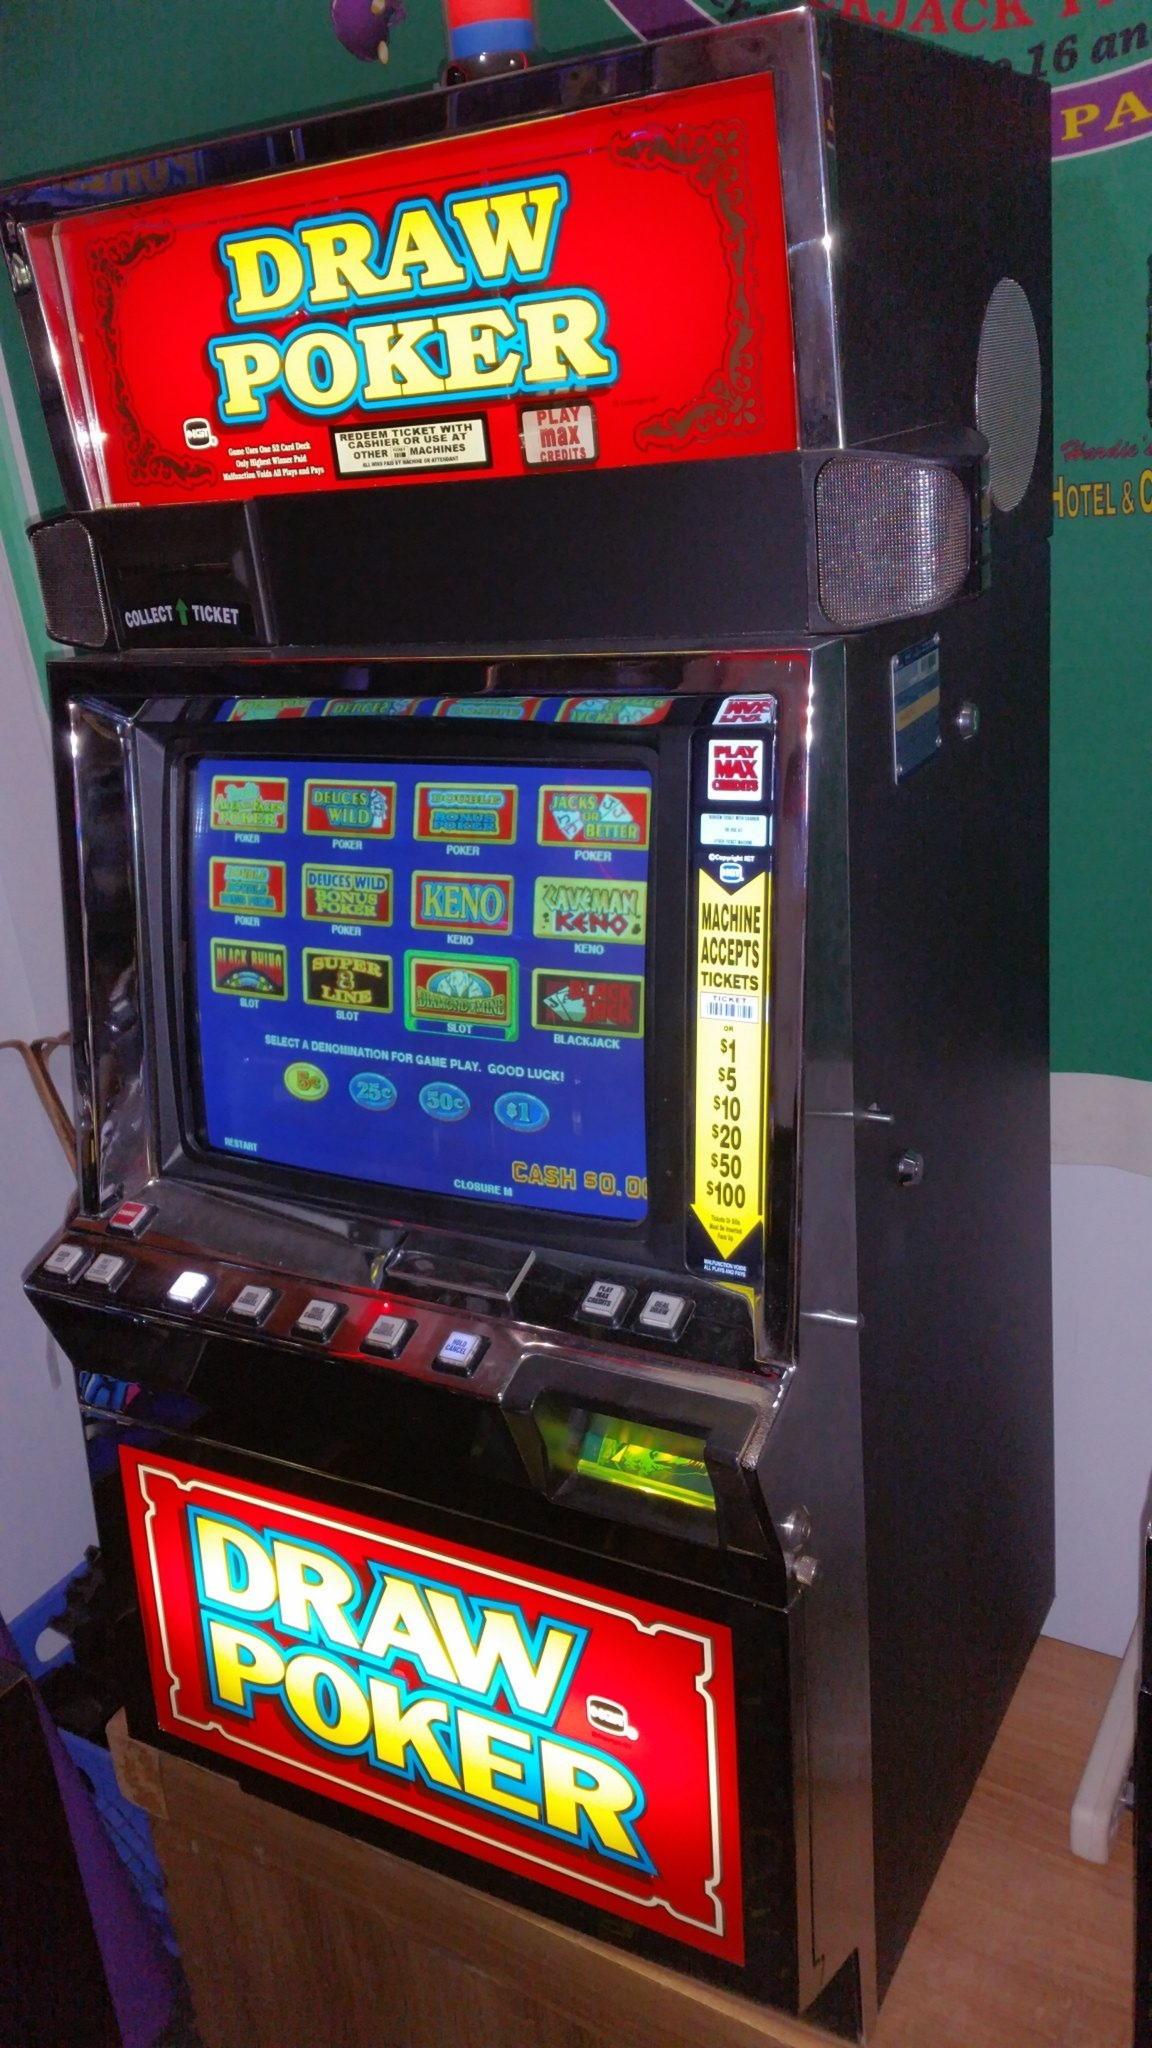 640% Match at a casino at 14 Redit